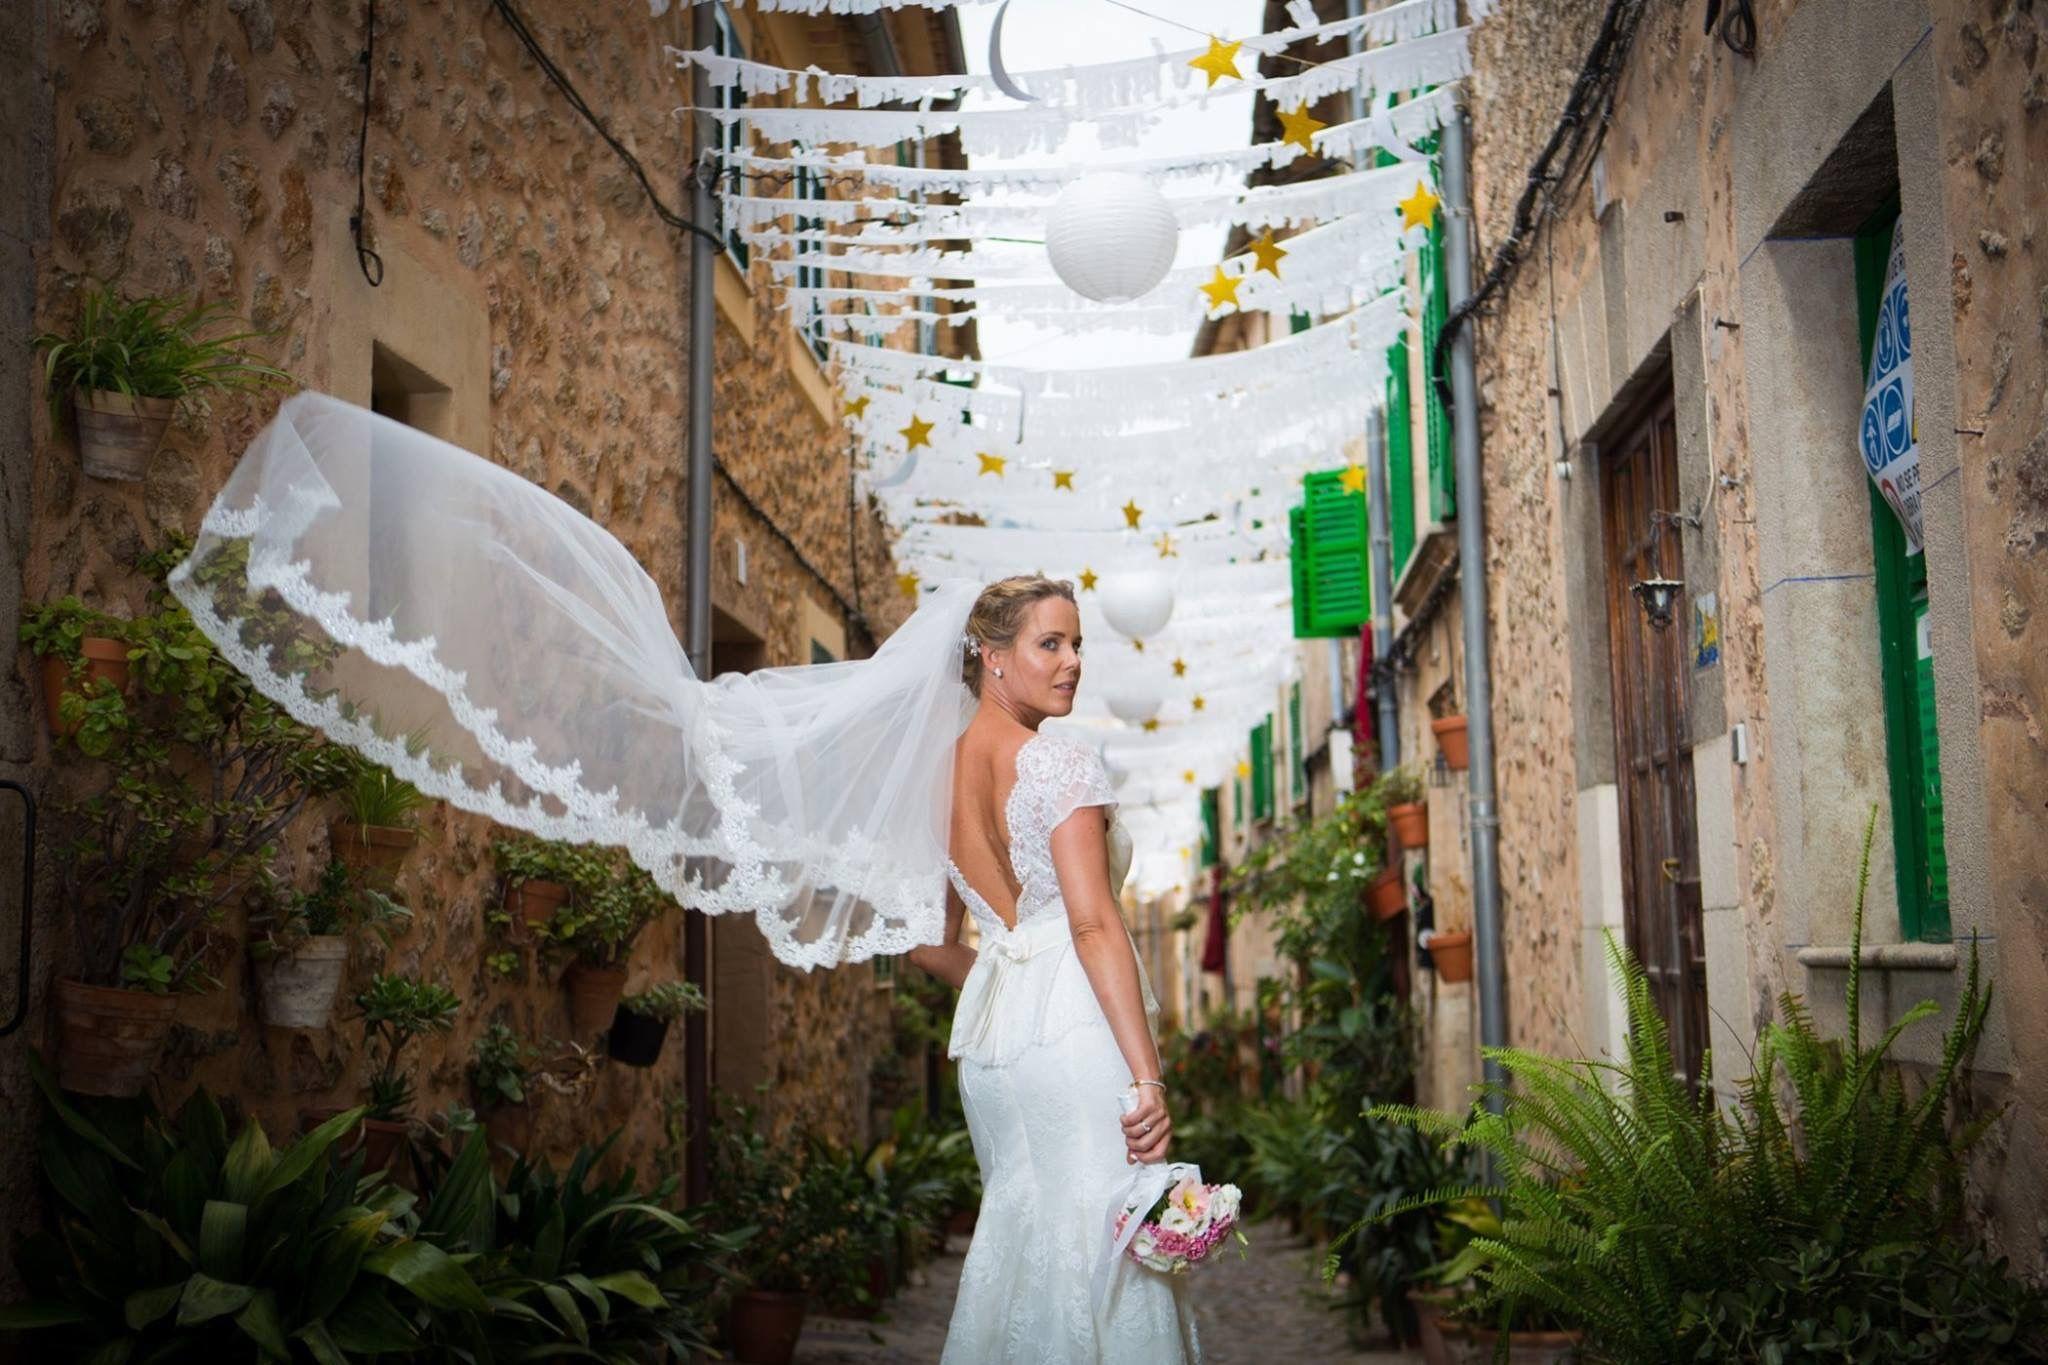 Wedding in Malorca